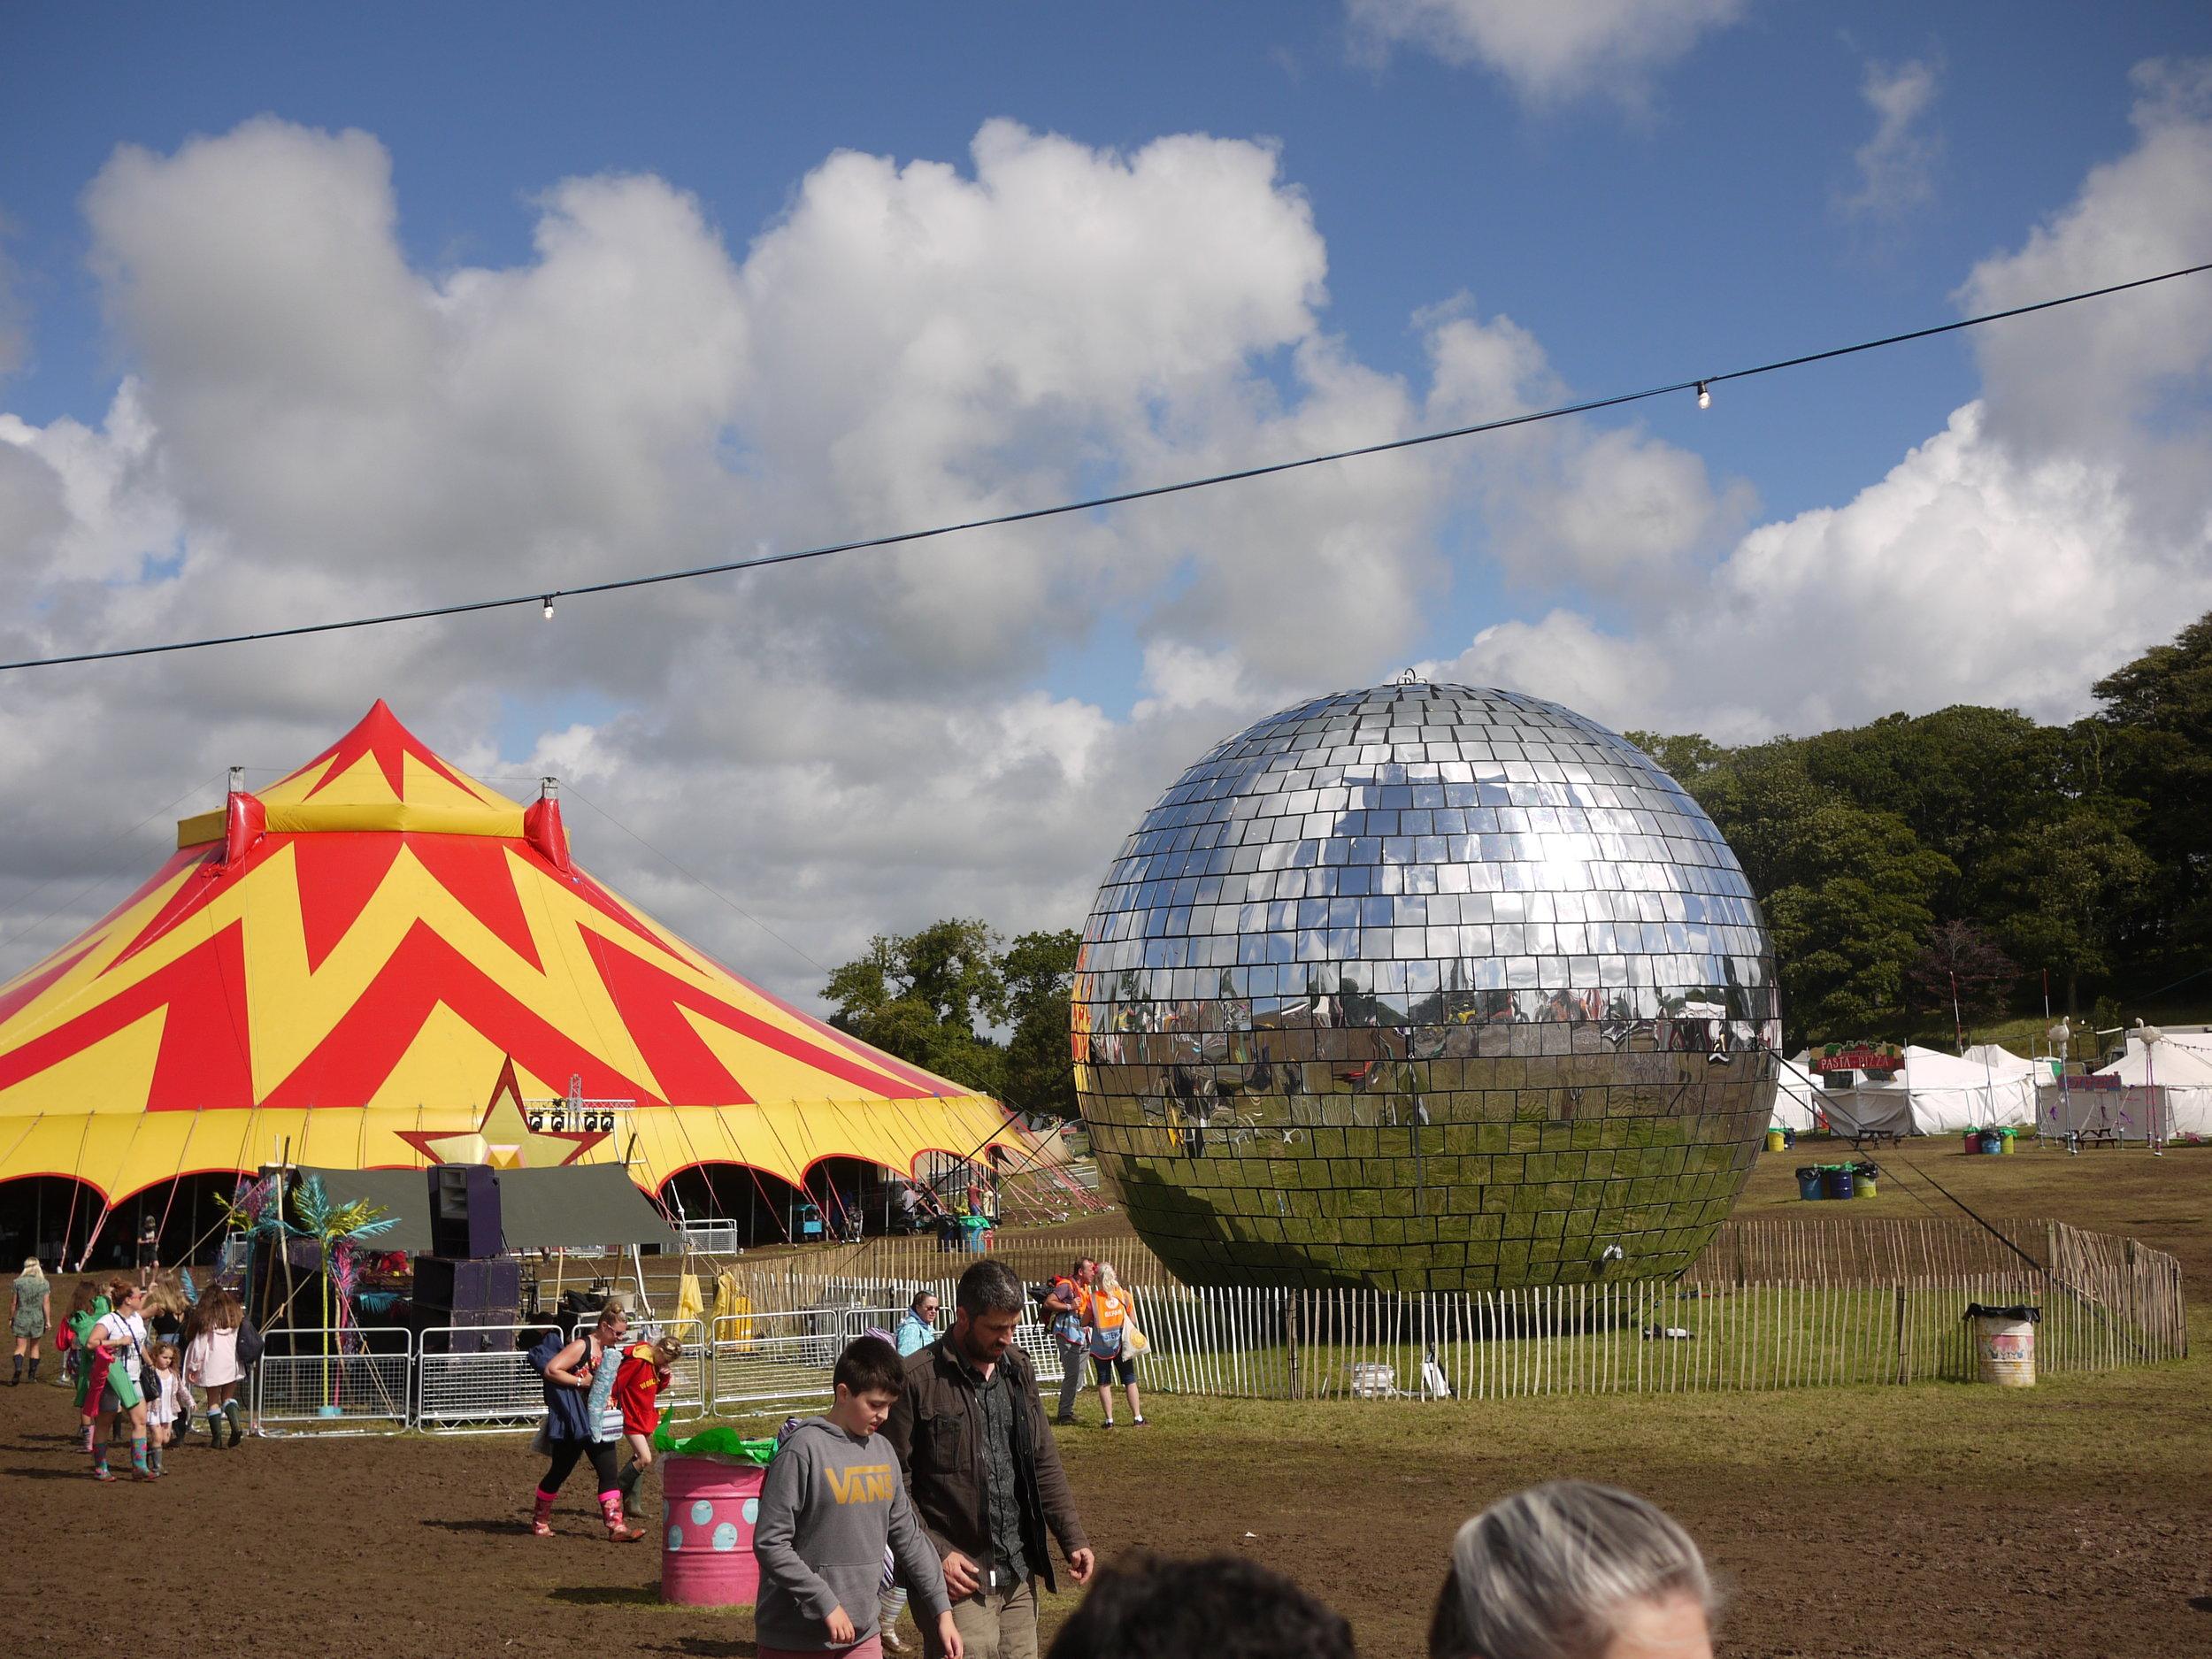 Worlds biggest disco ball!